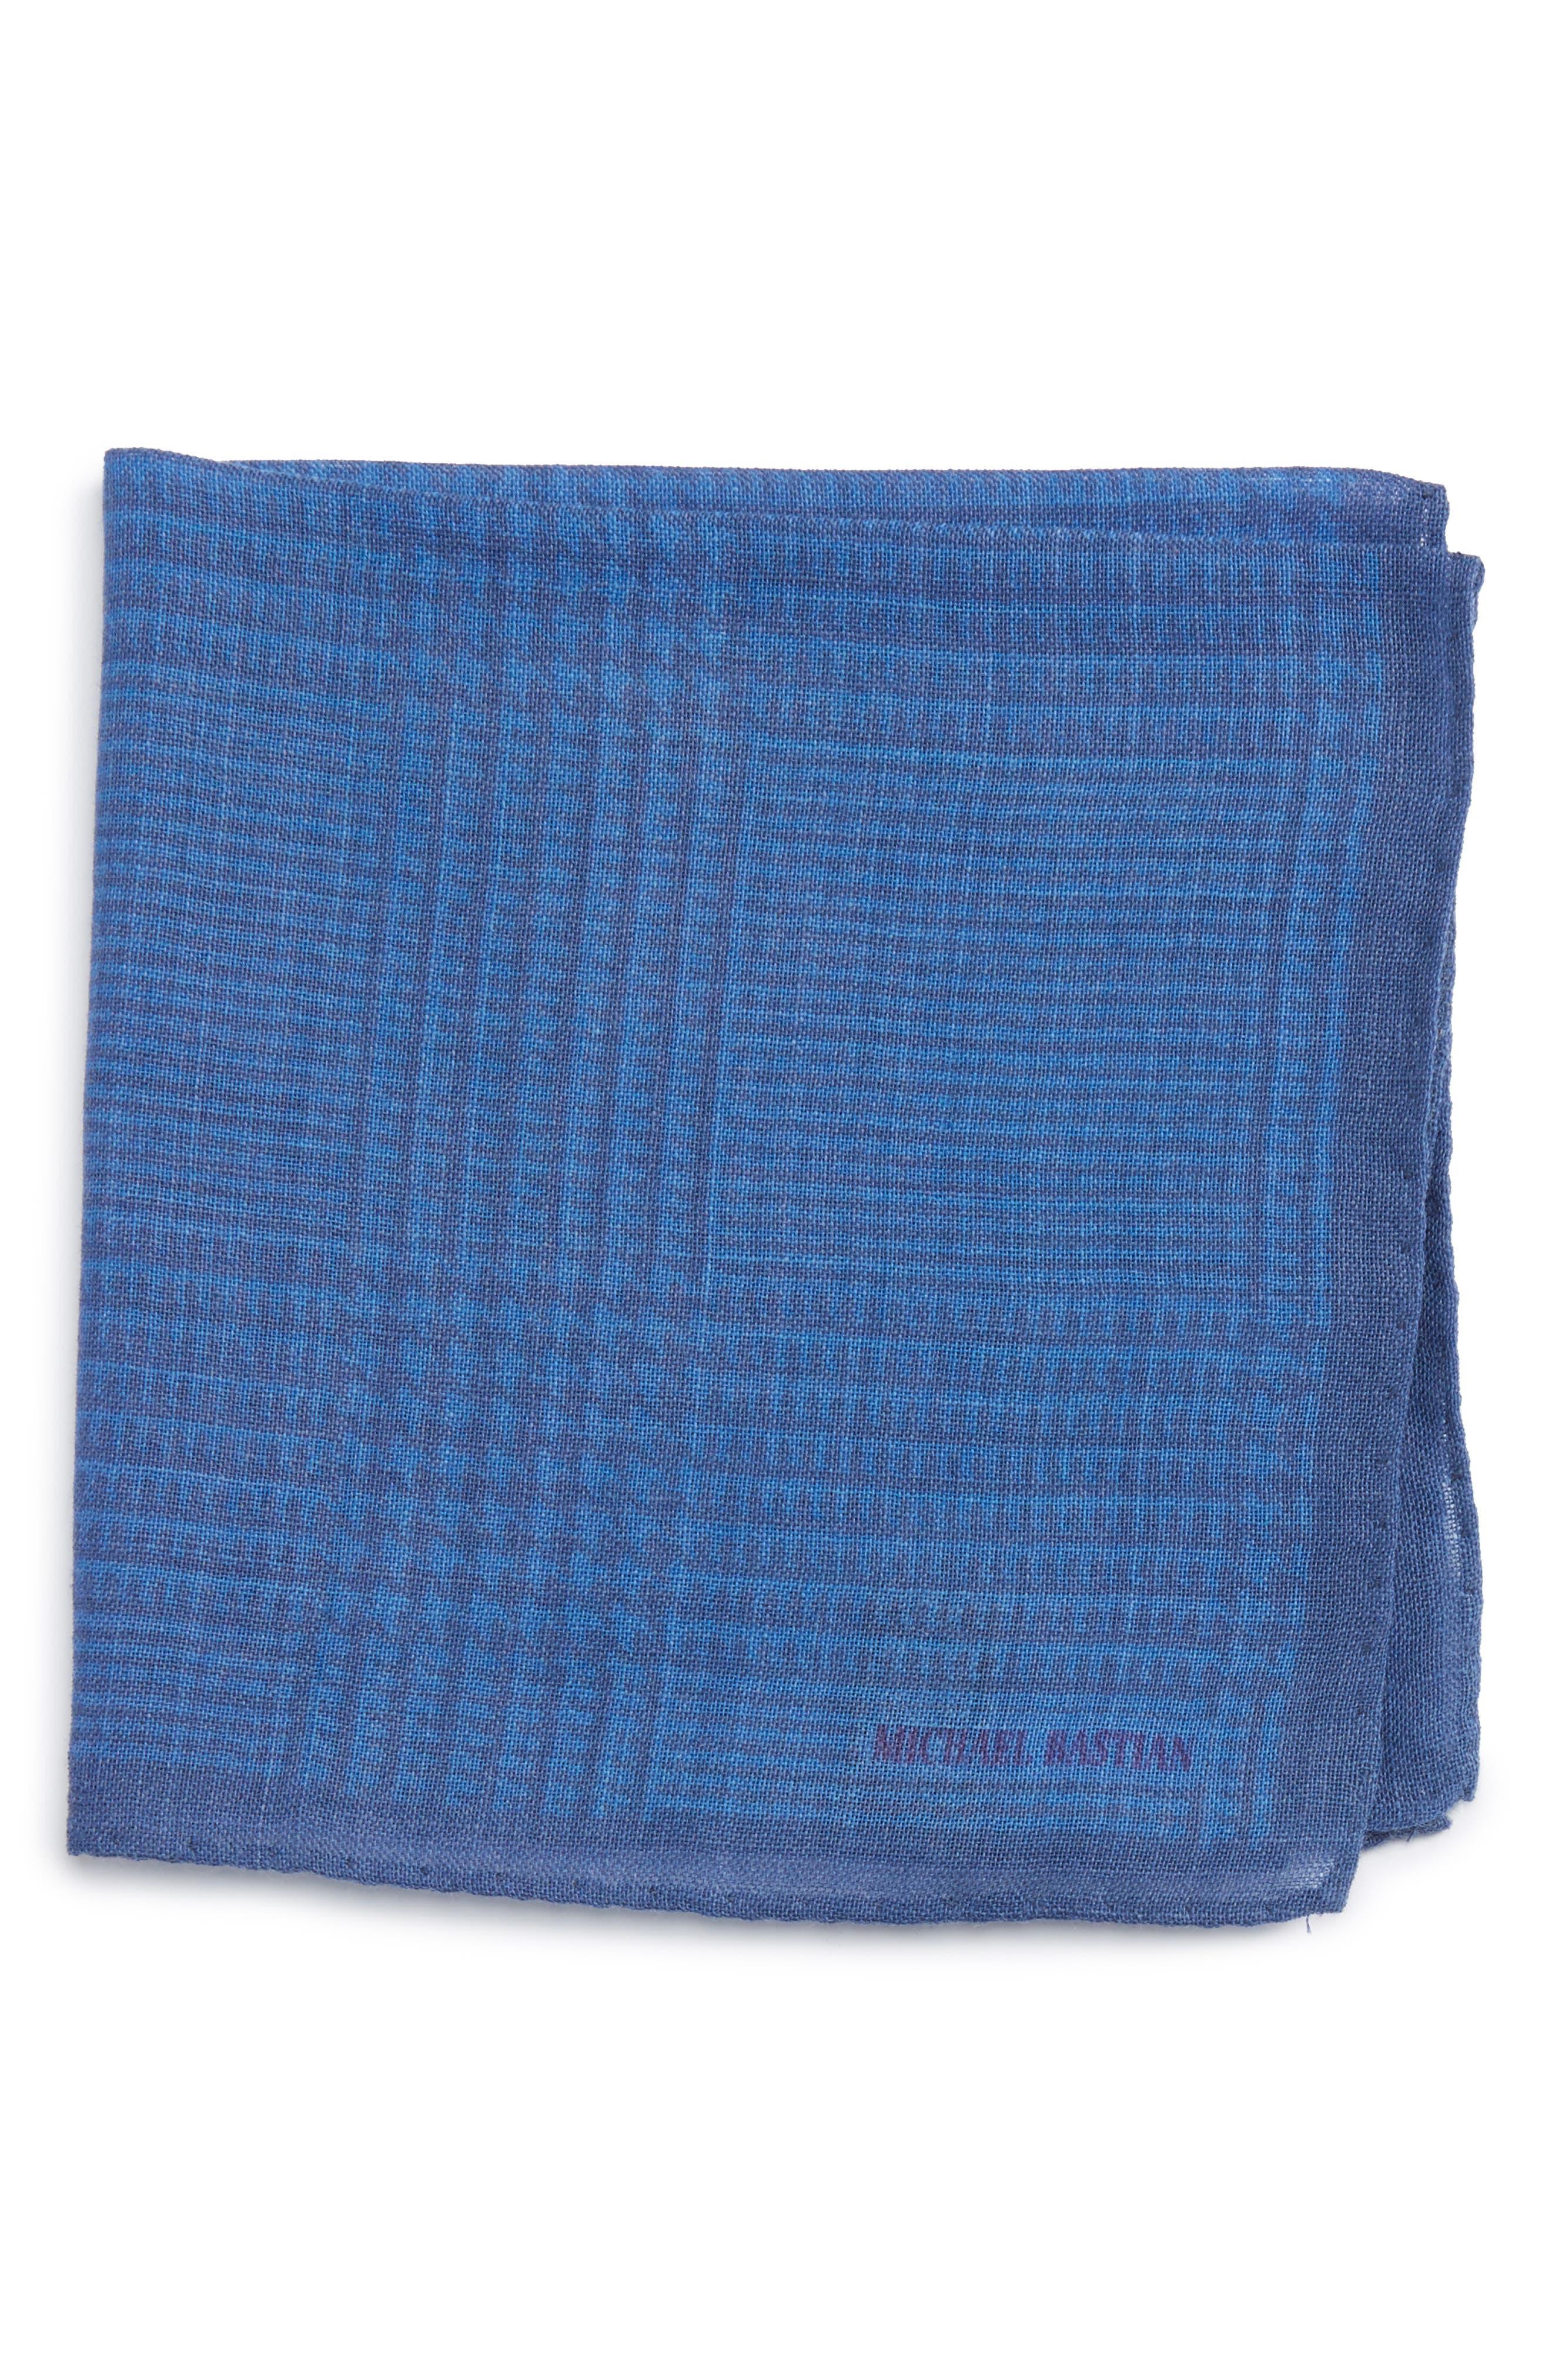 Michael Bastian Grid Pocket Square